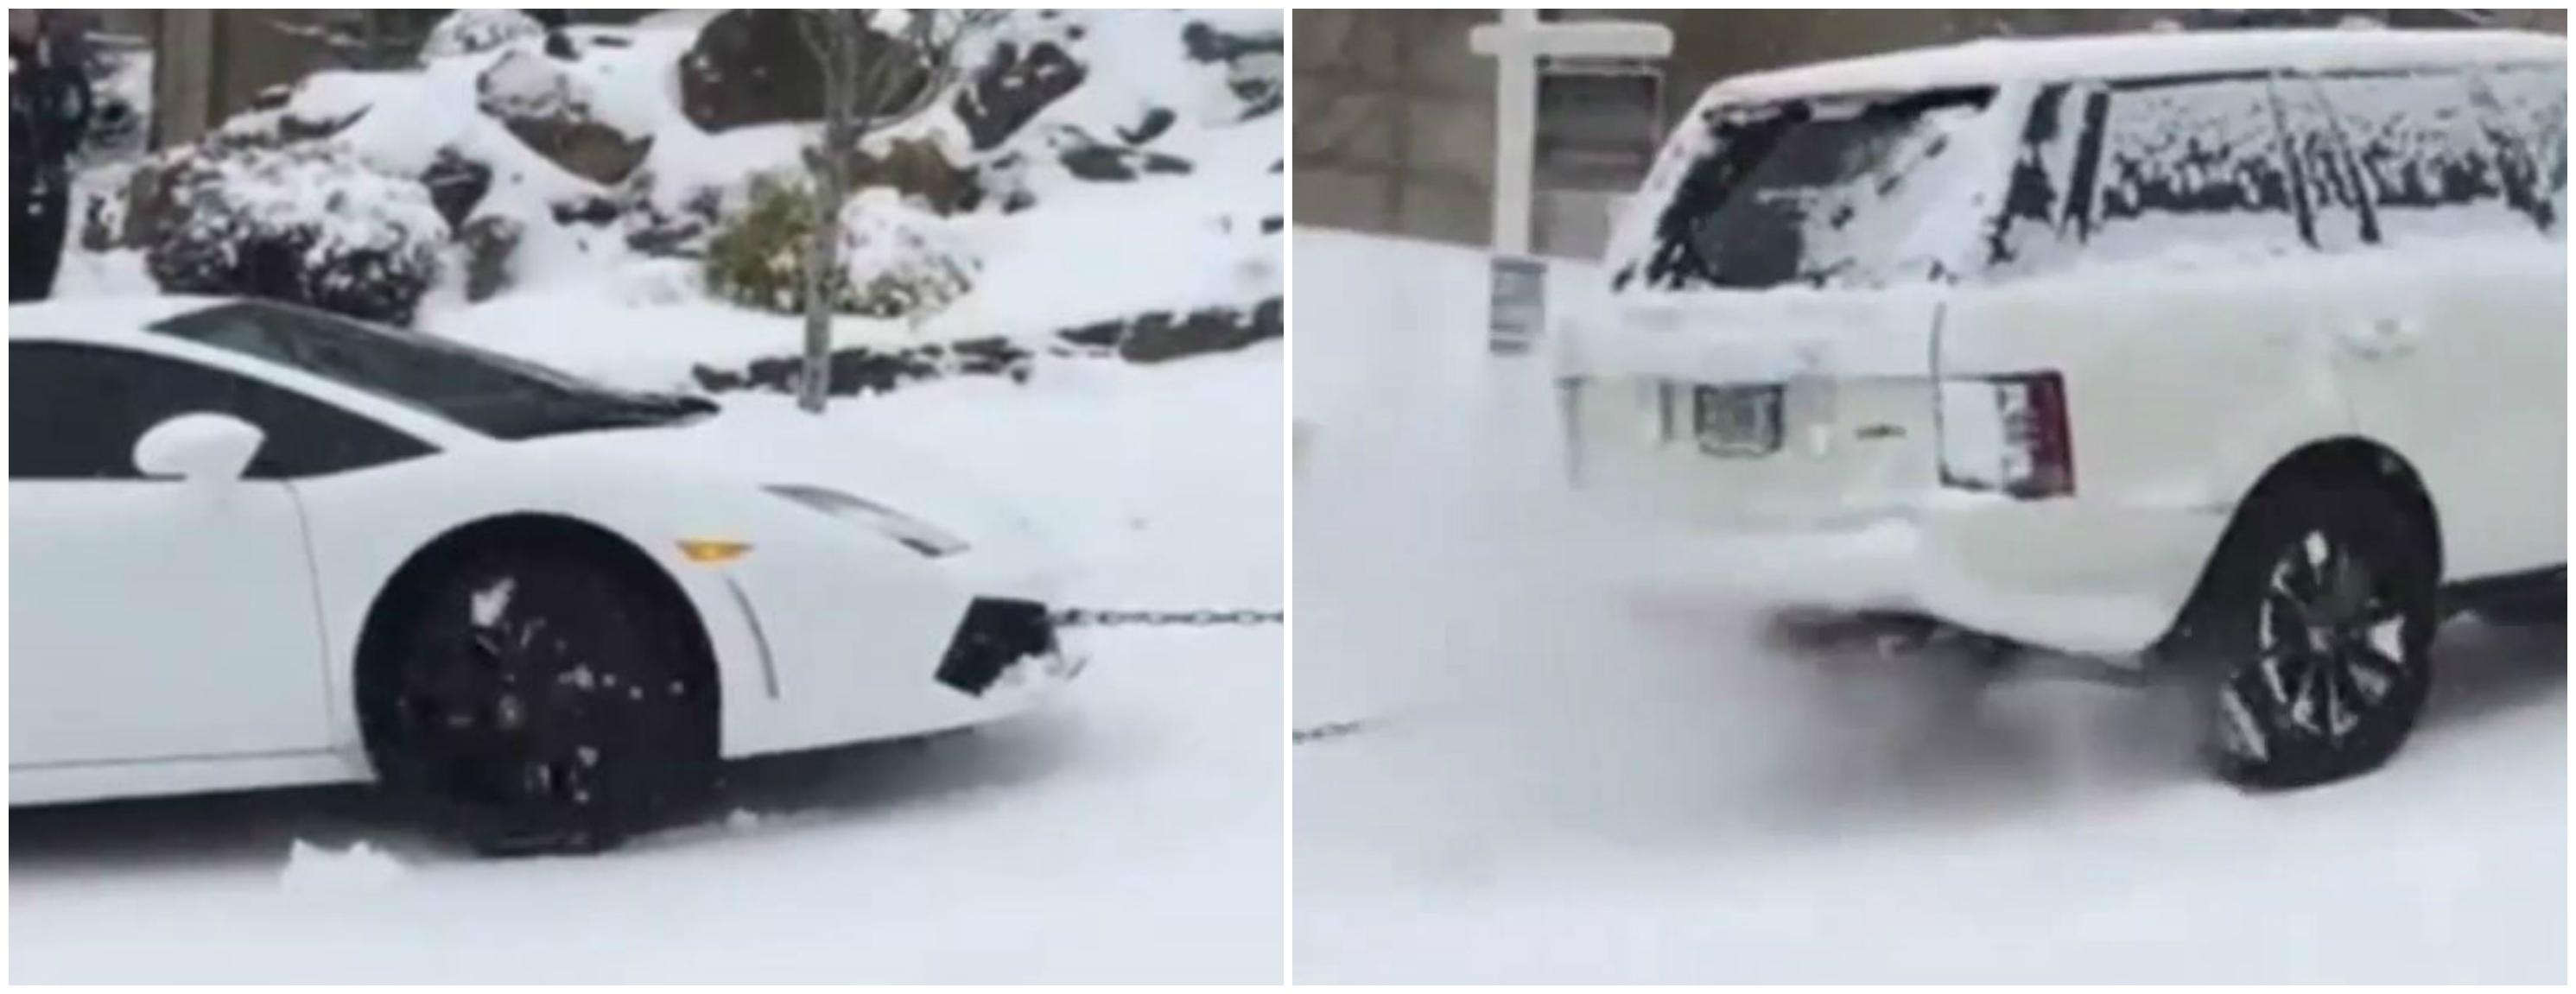 Snow Stuck Lamborghini and Range Rover Rescue Car Are a Helpless